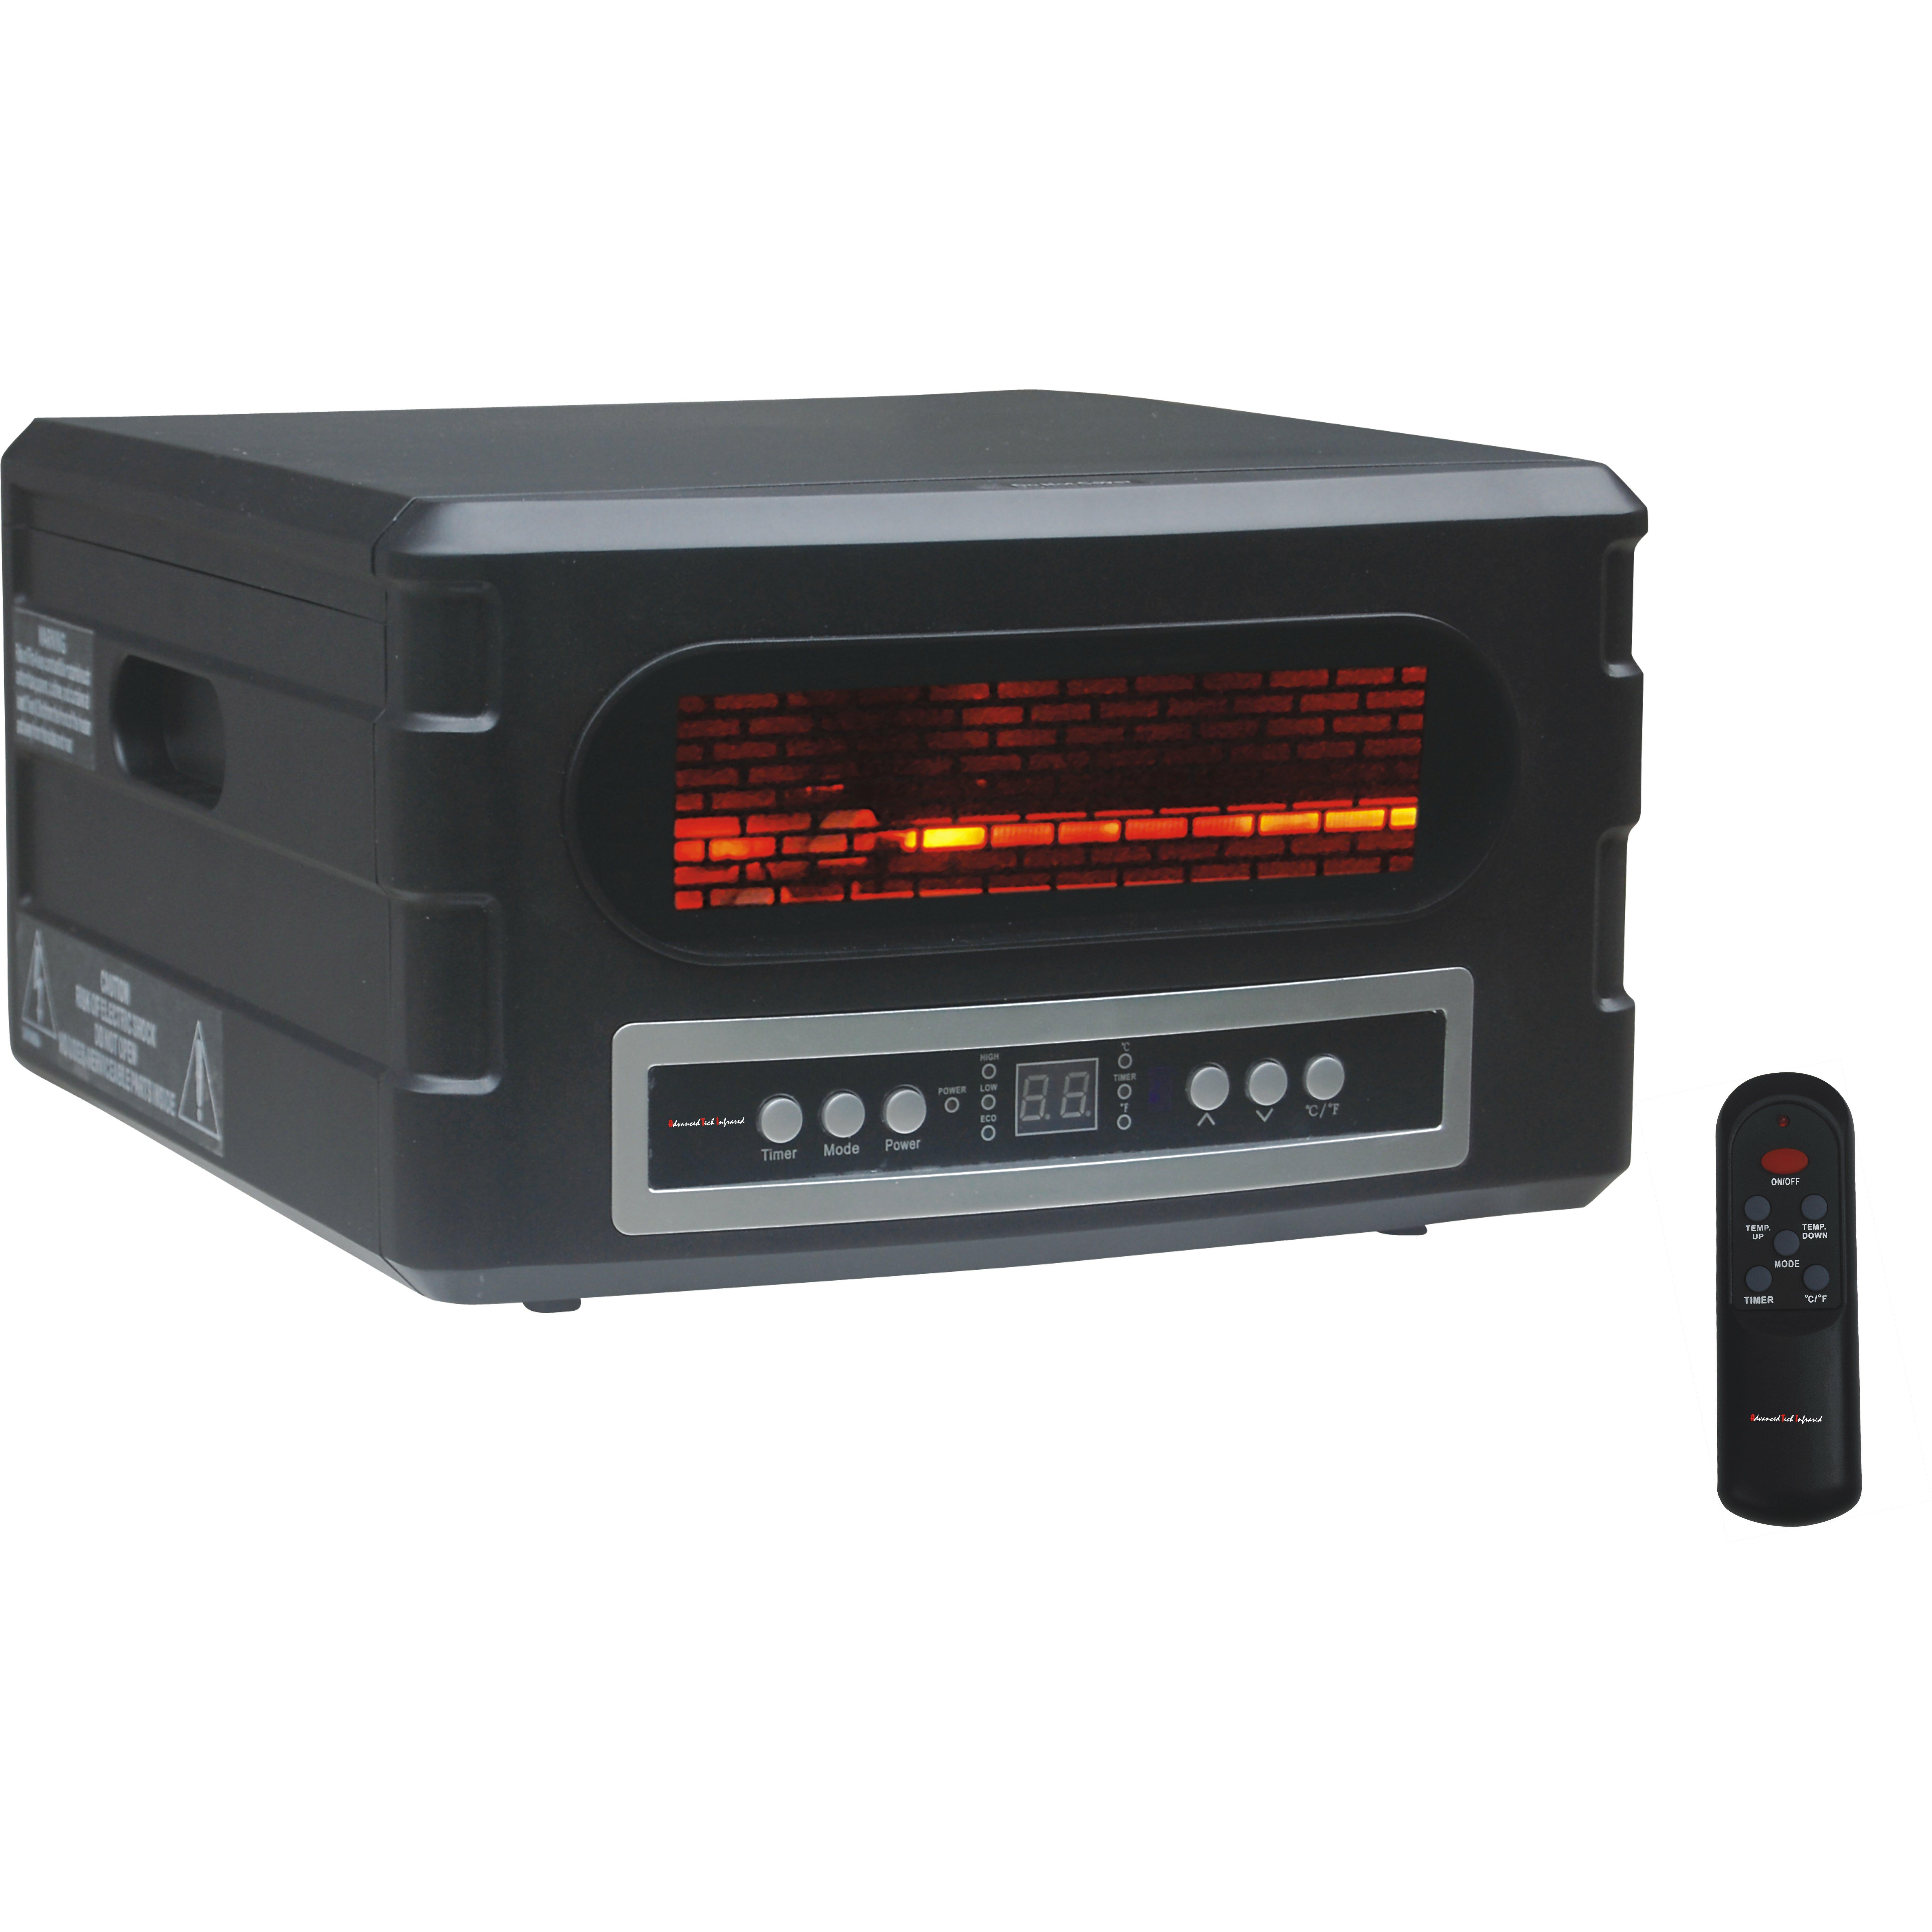 Advanced Tech Infrared 1 500 Watt Portable Electric